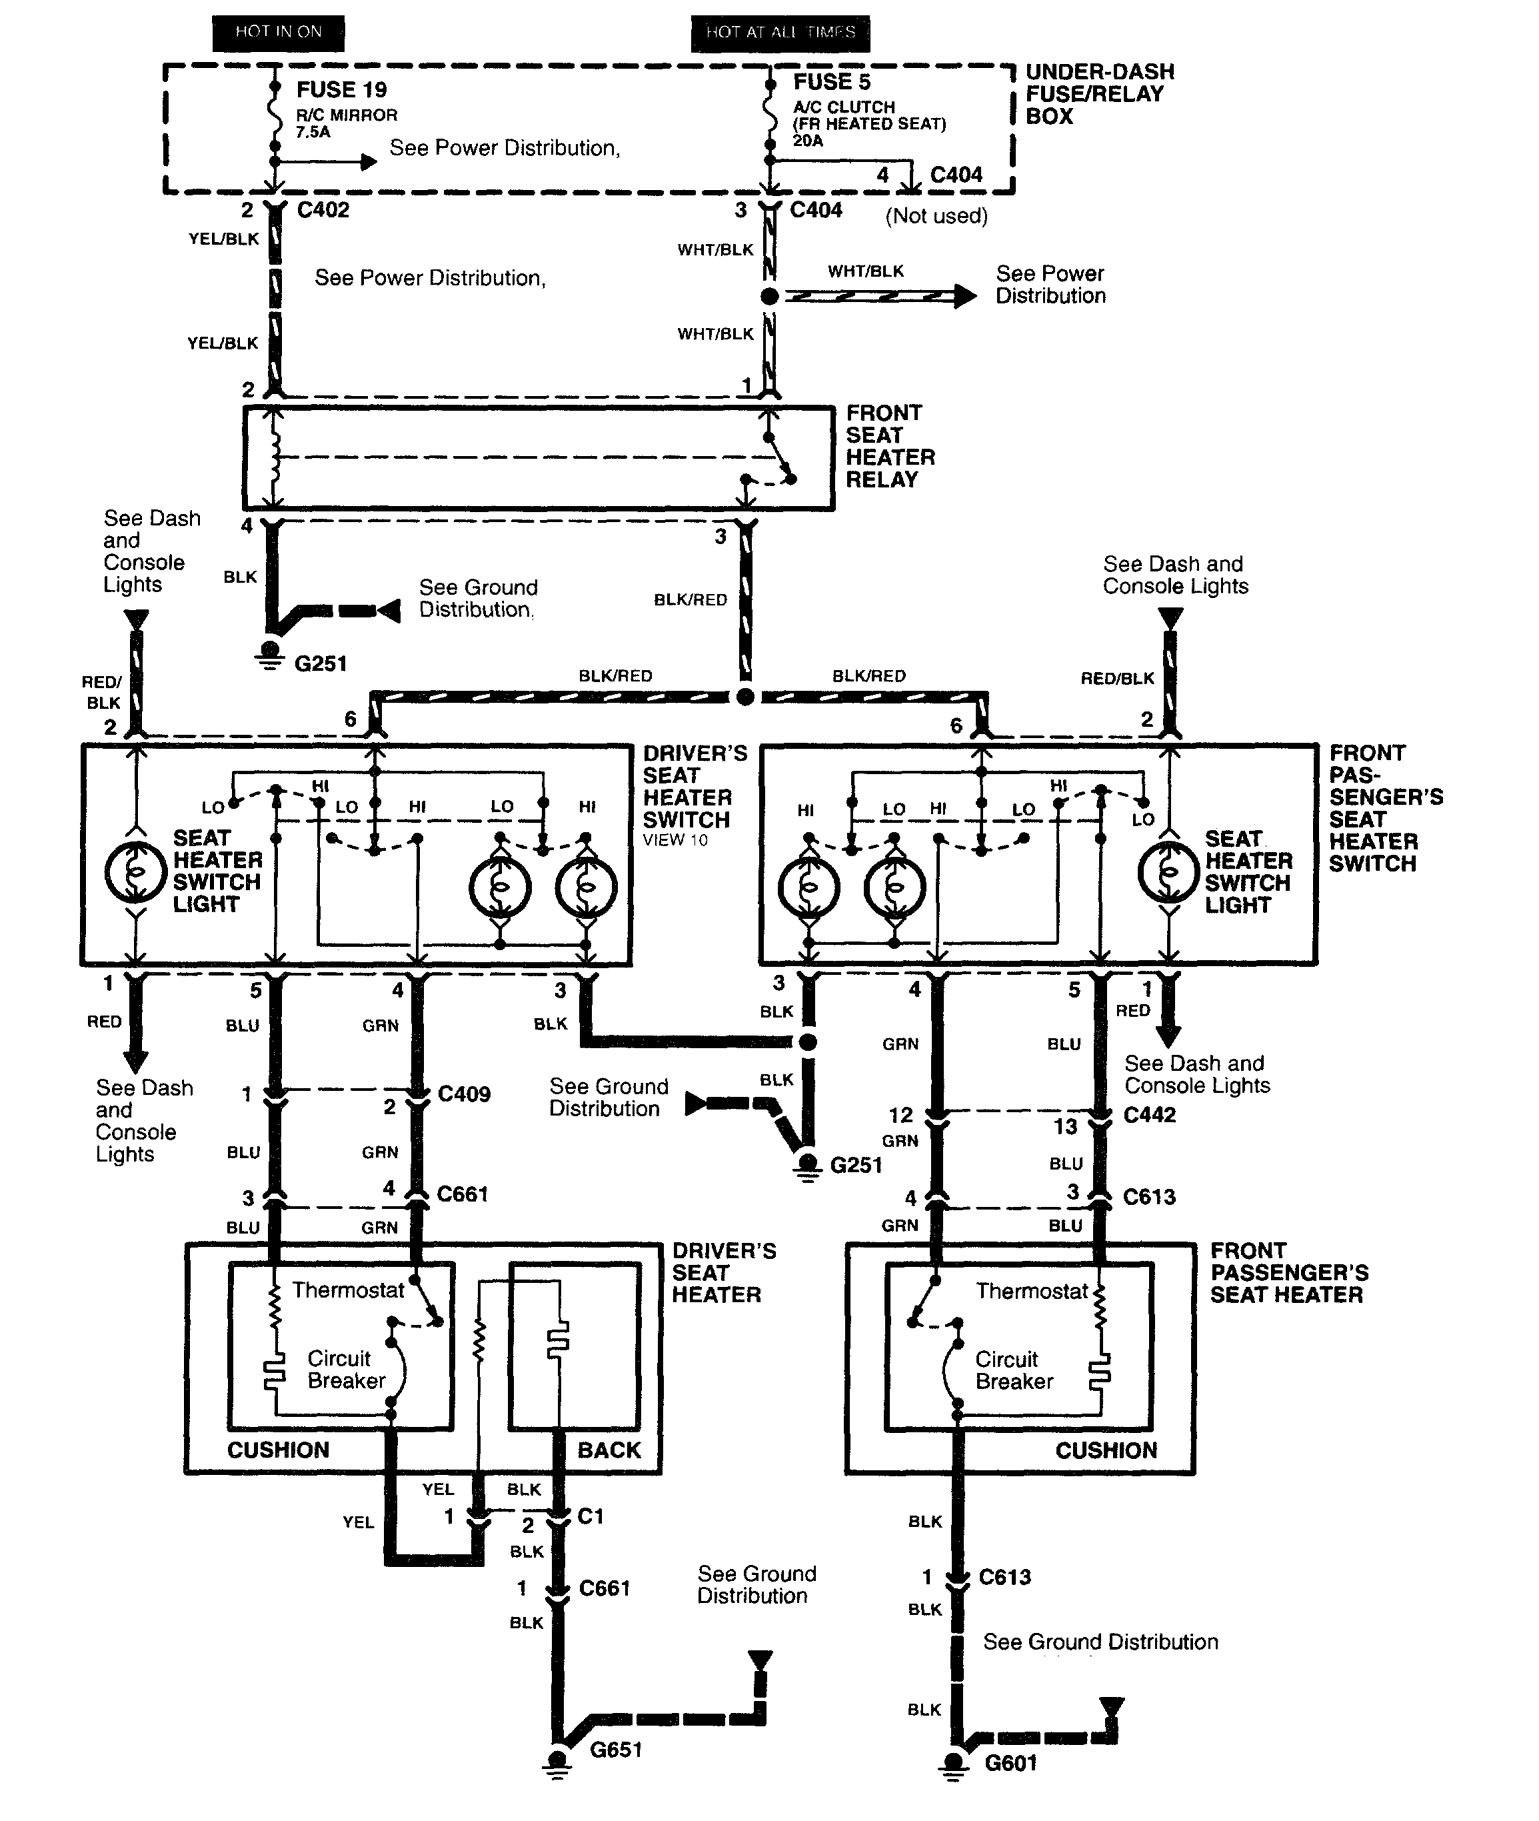 03 acura cl wiring diagram 97 acura cl engine diagram